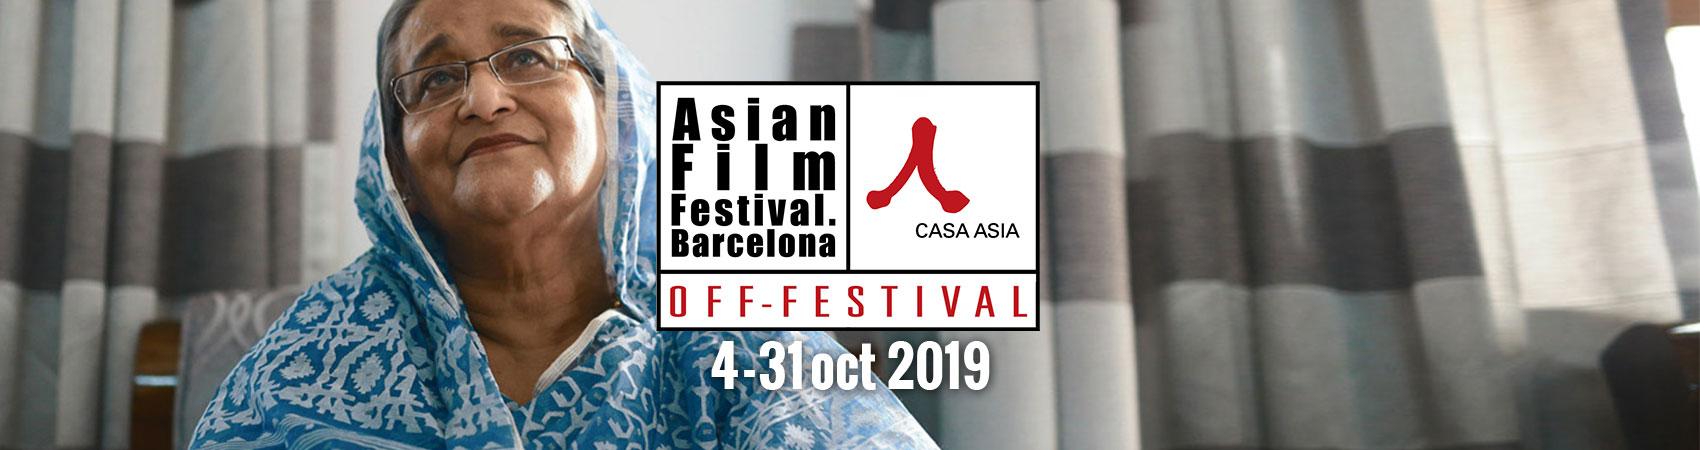 Картинки по запросу asian film festival barcelona 2019